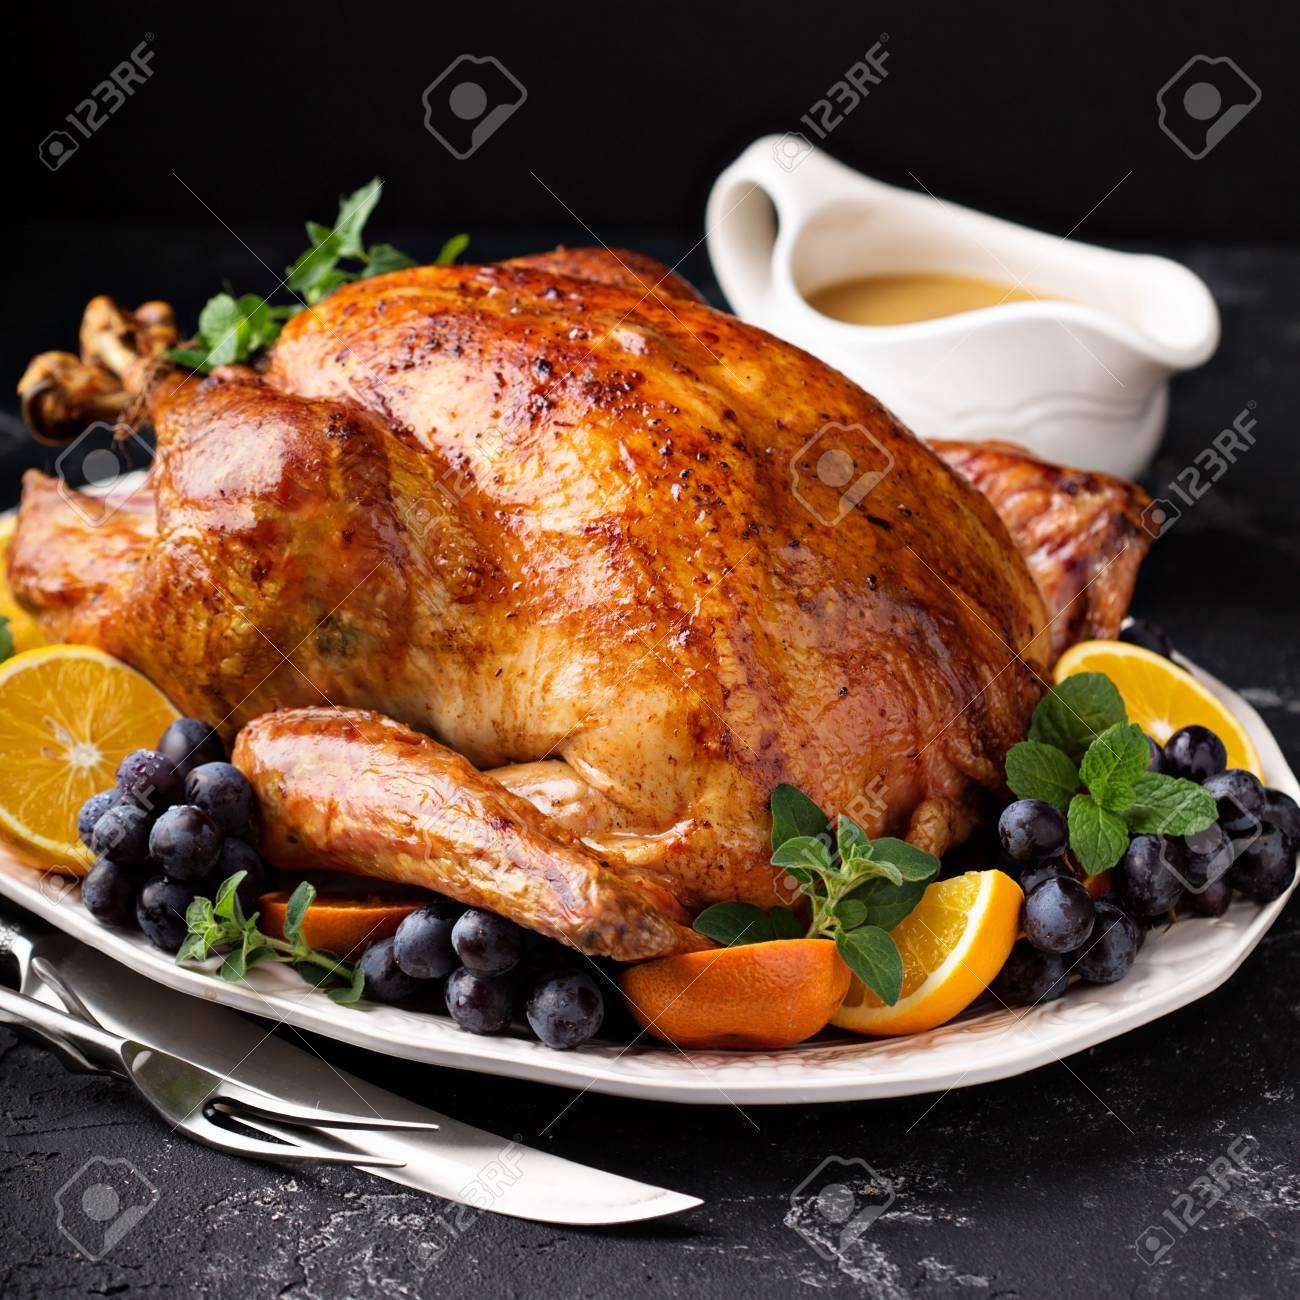 Festive celebration roasted turkey for Thanksgiving - 90943212